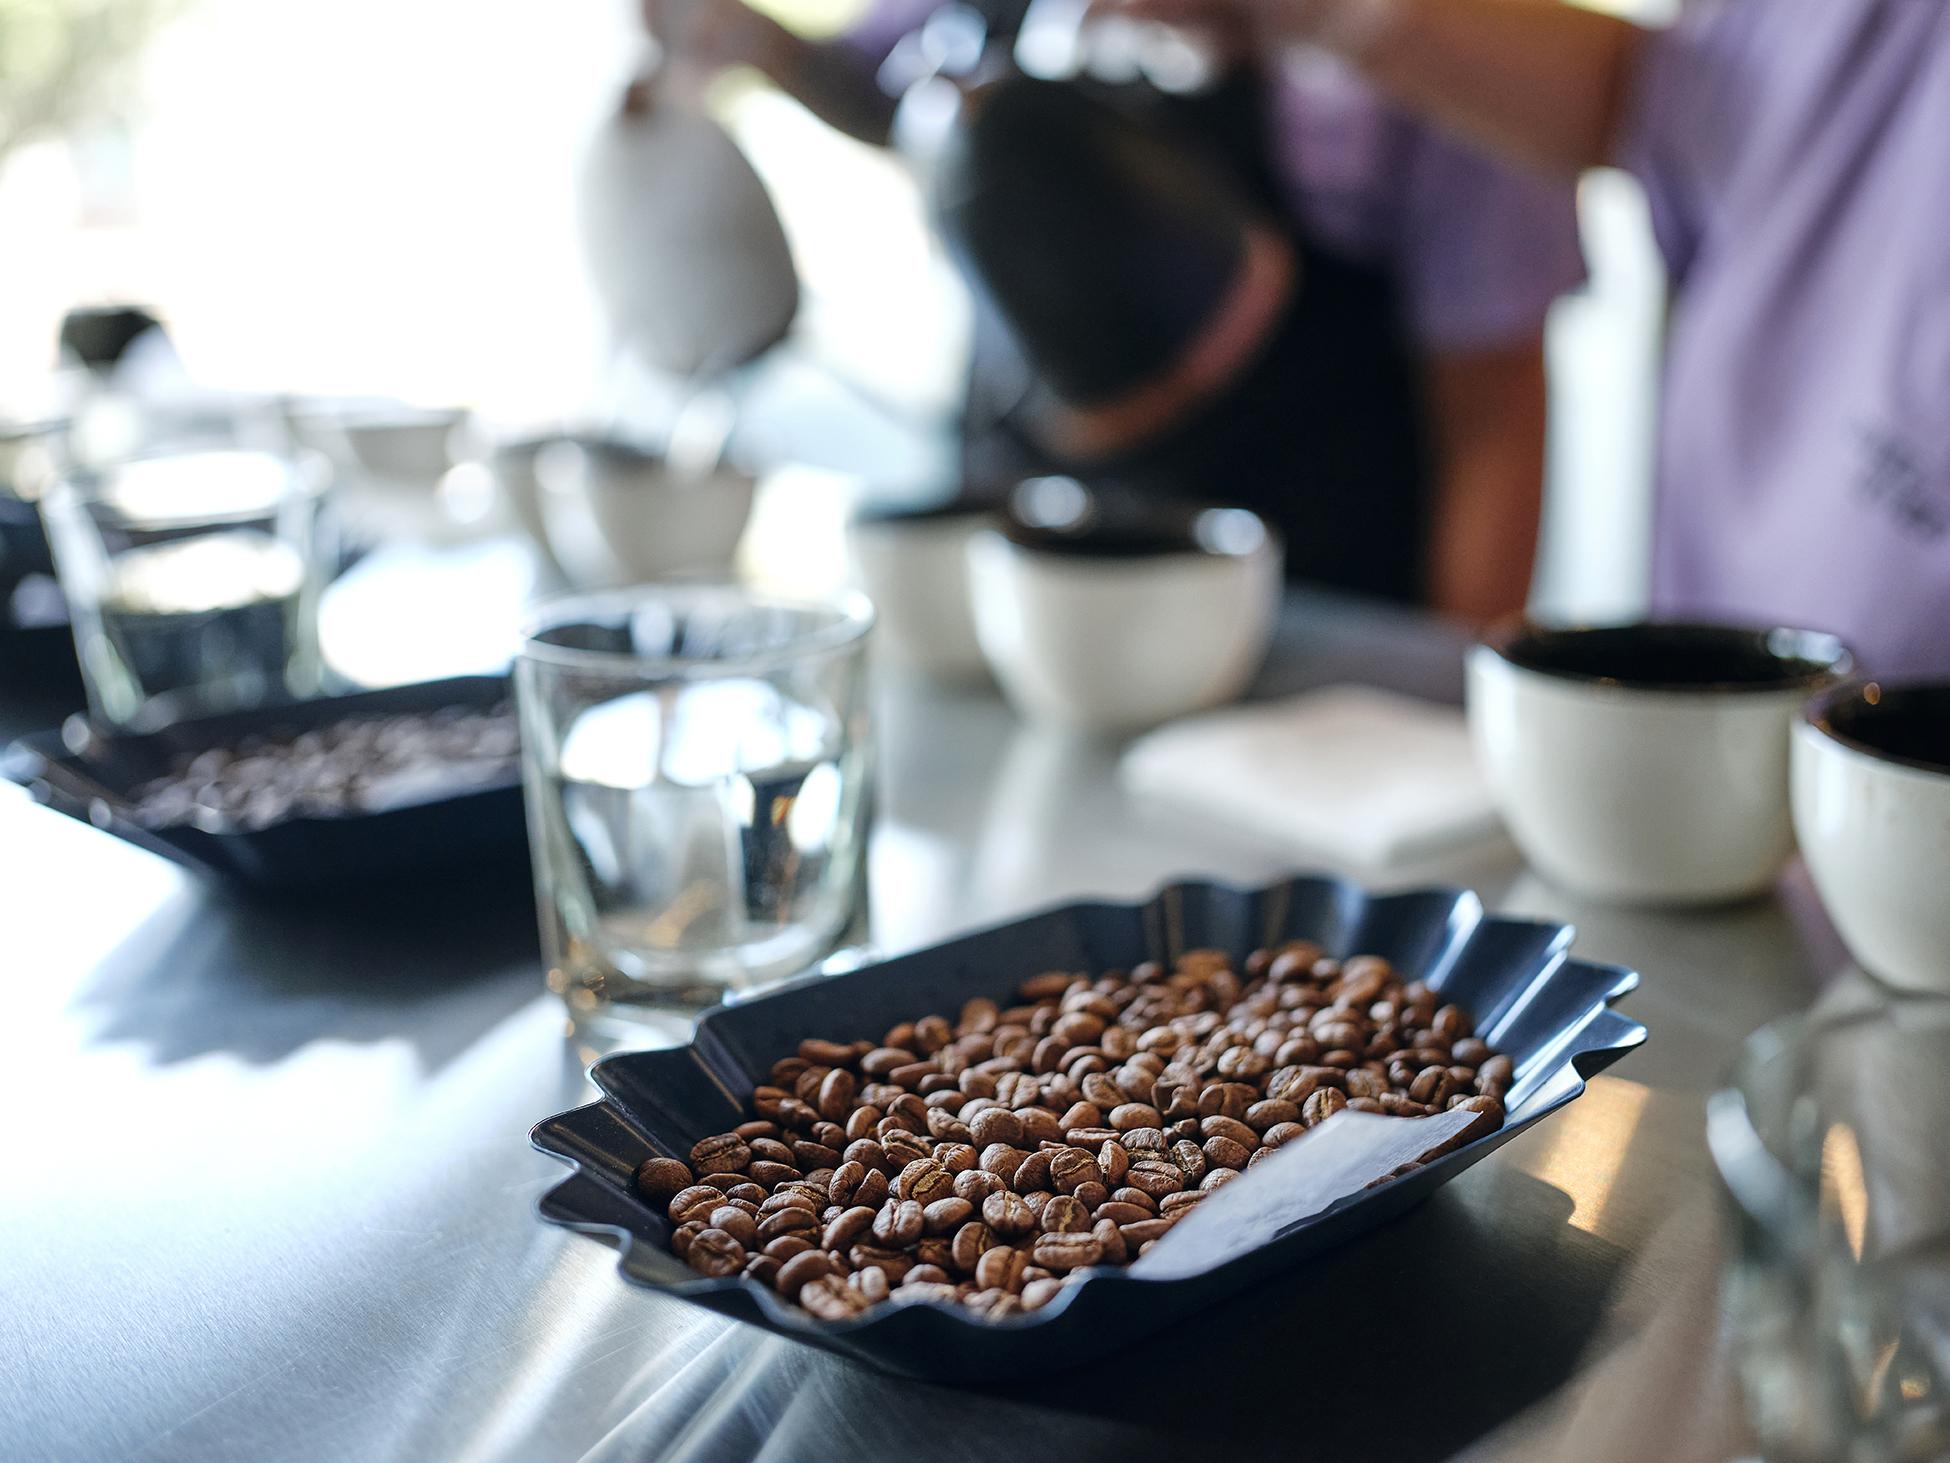 Nahaufnahme des Prozesses des Kaffeeschröpfens